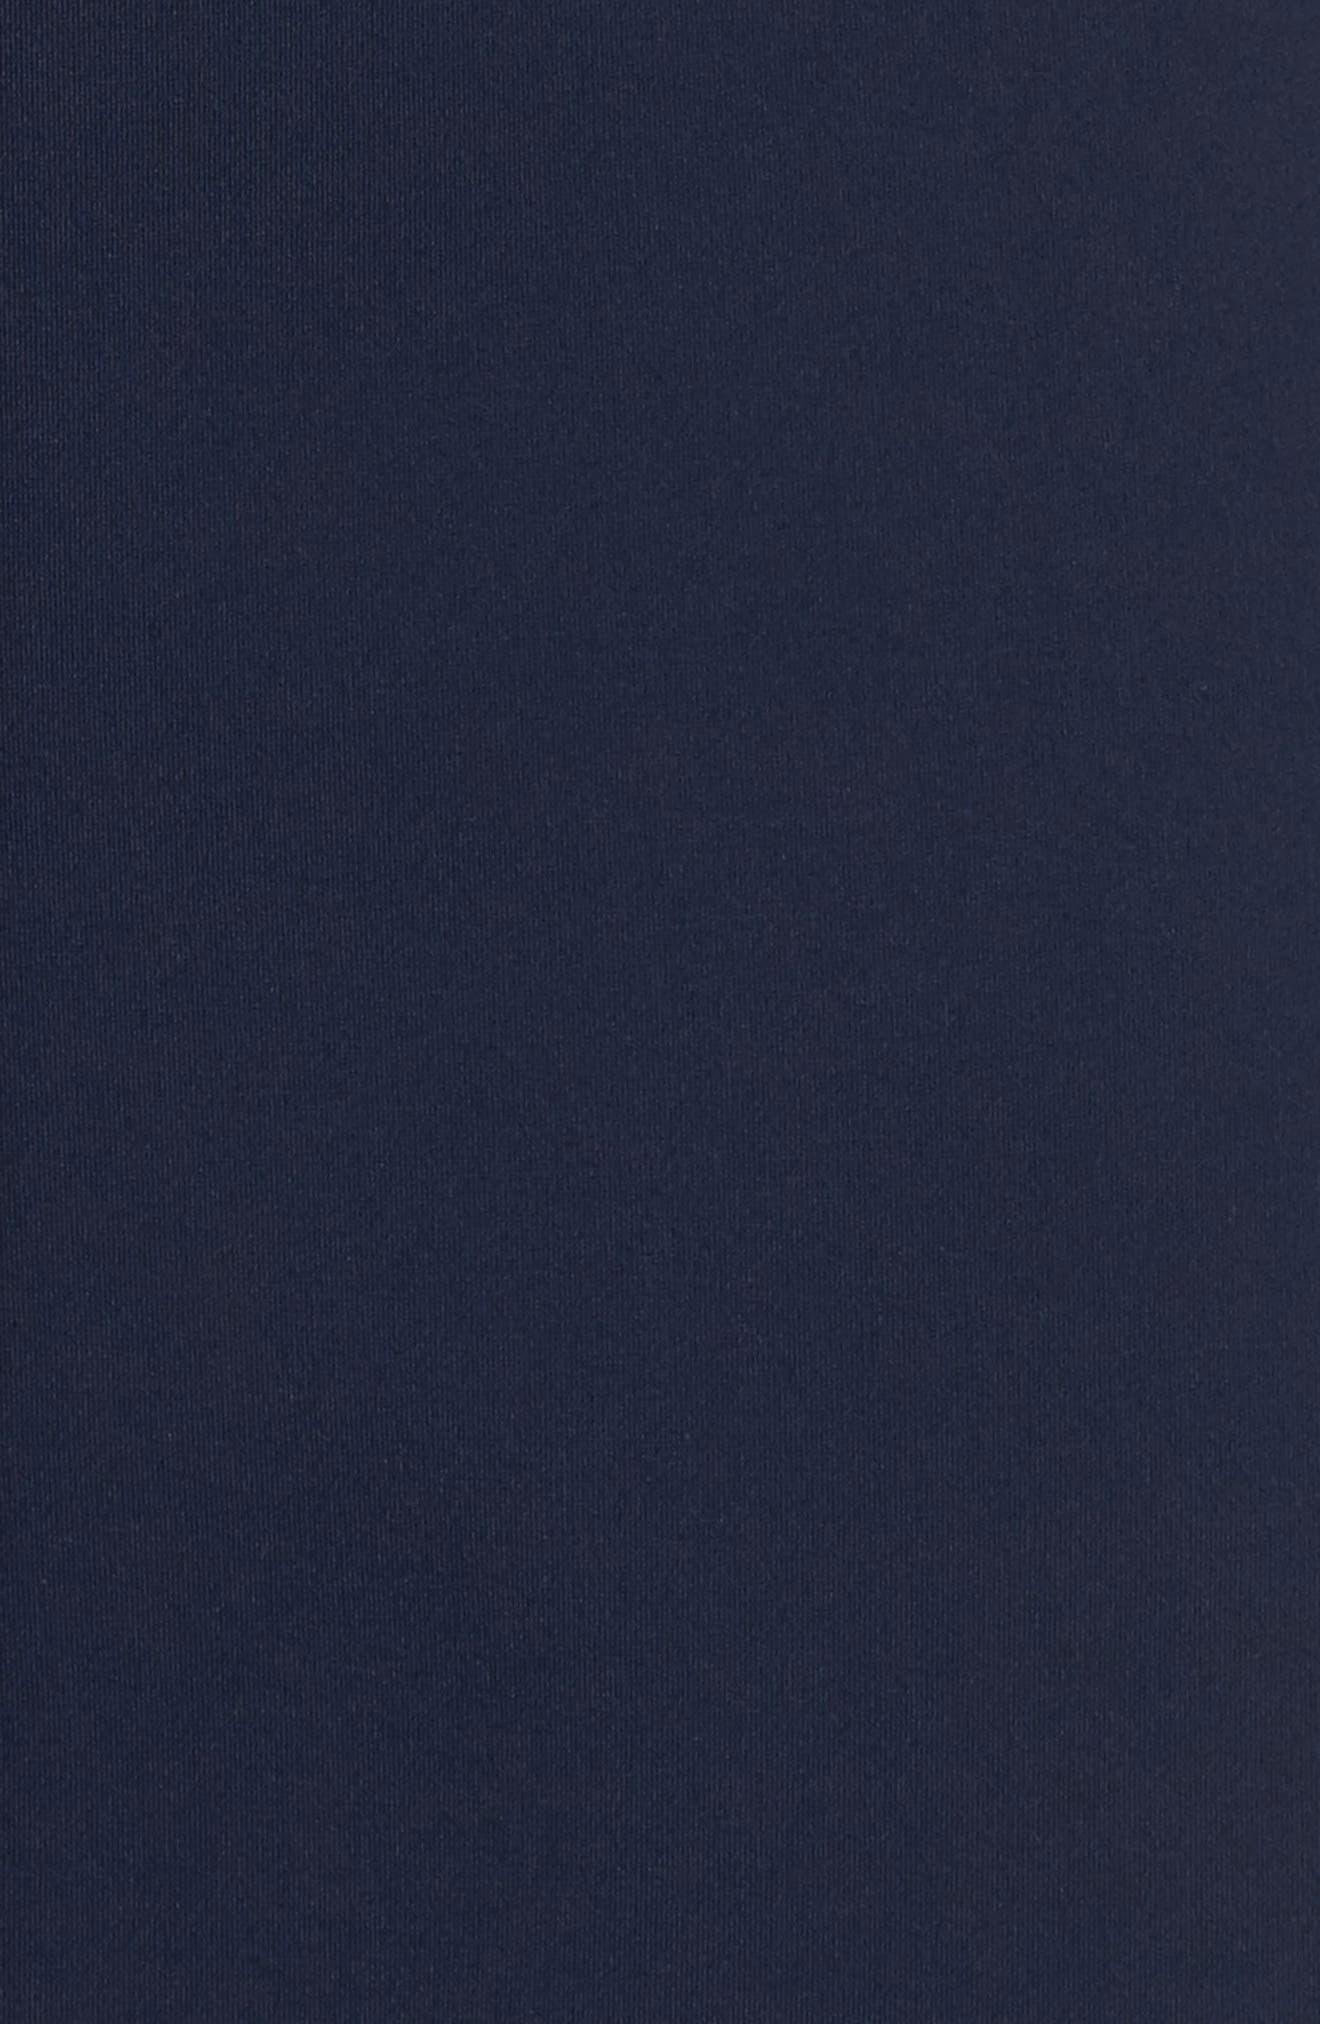 Vanessa Bell Sleeve Dress,                             Alternate thumbnail 5, color,                             Midnight Blue/ Black